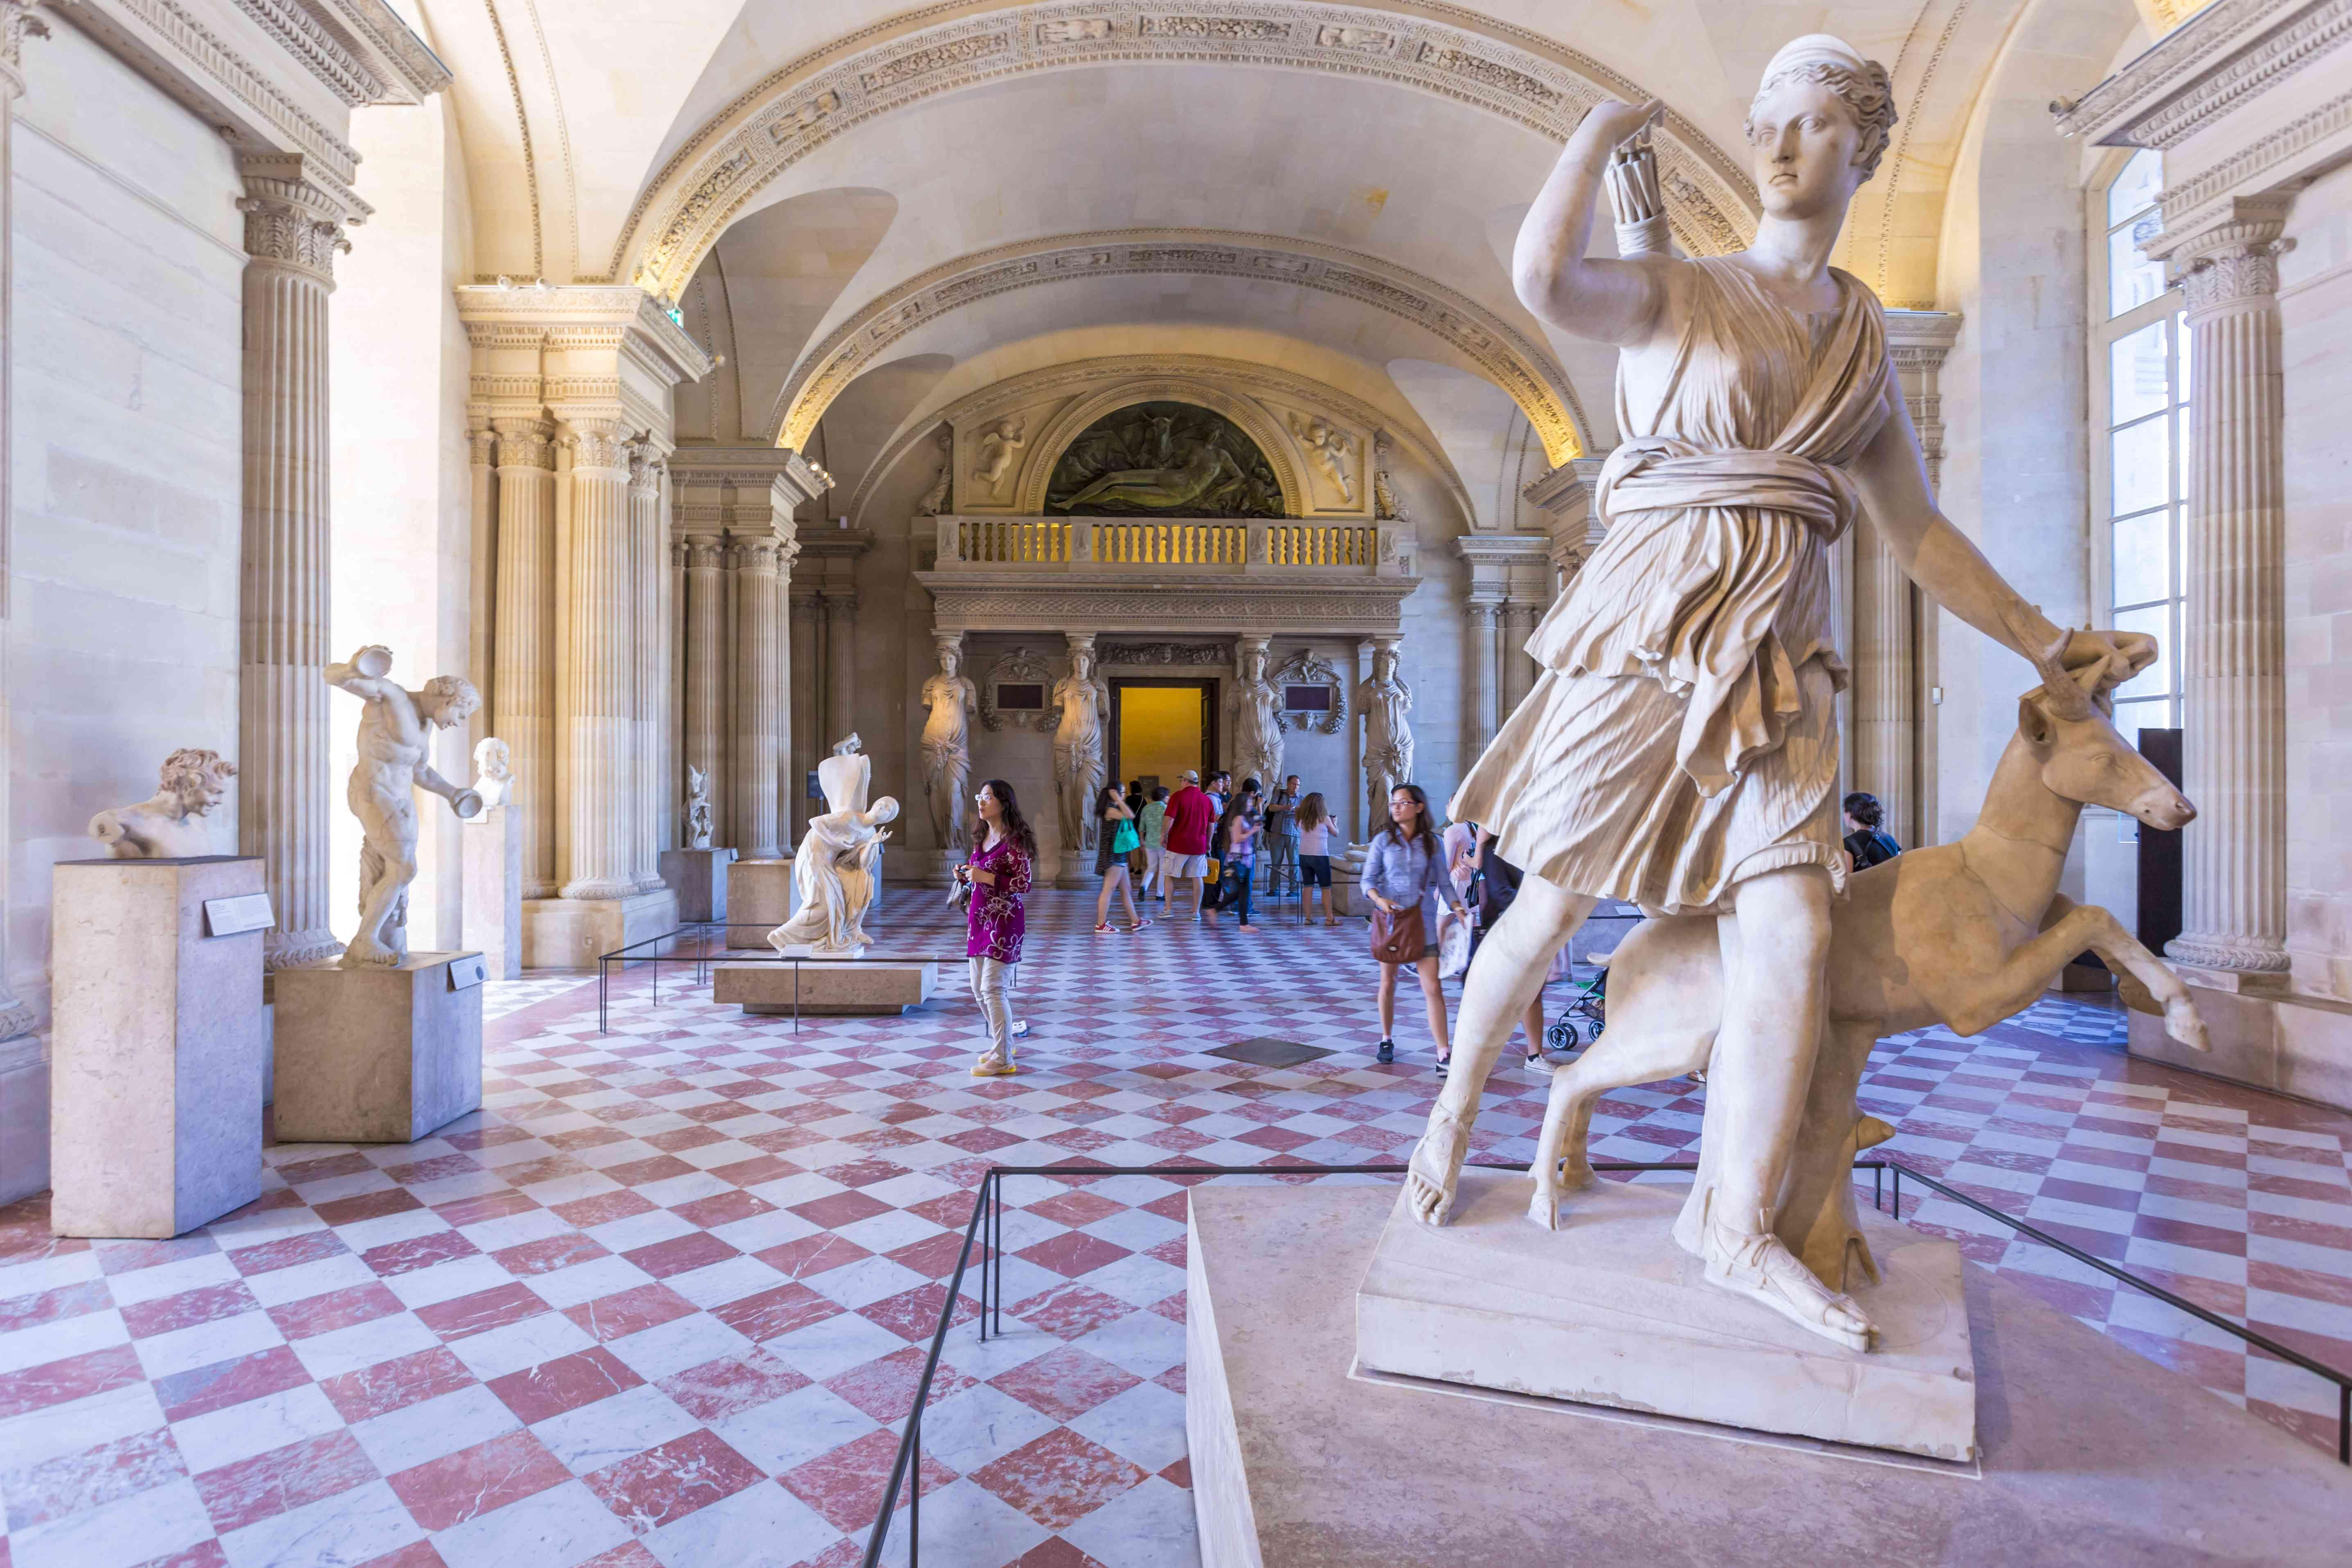 Artemis-Diana von Versailles Skulptur